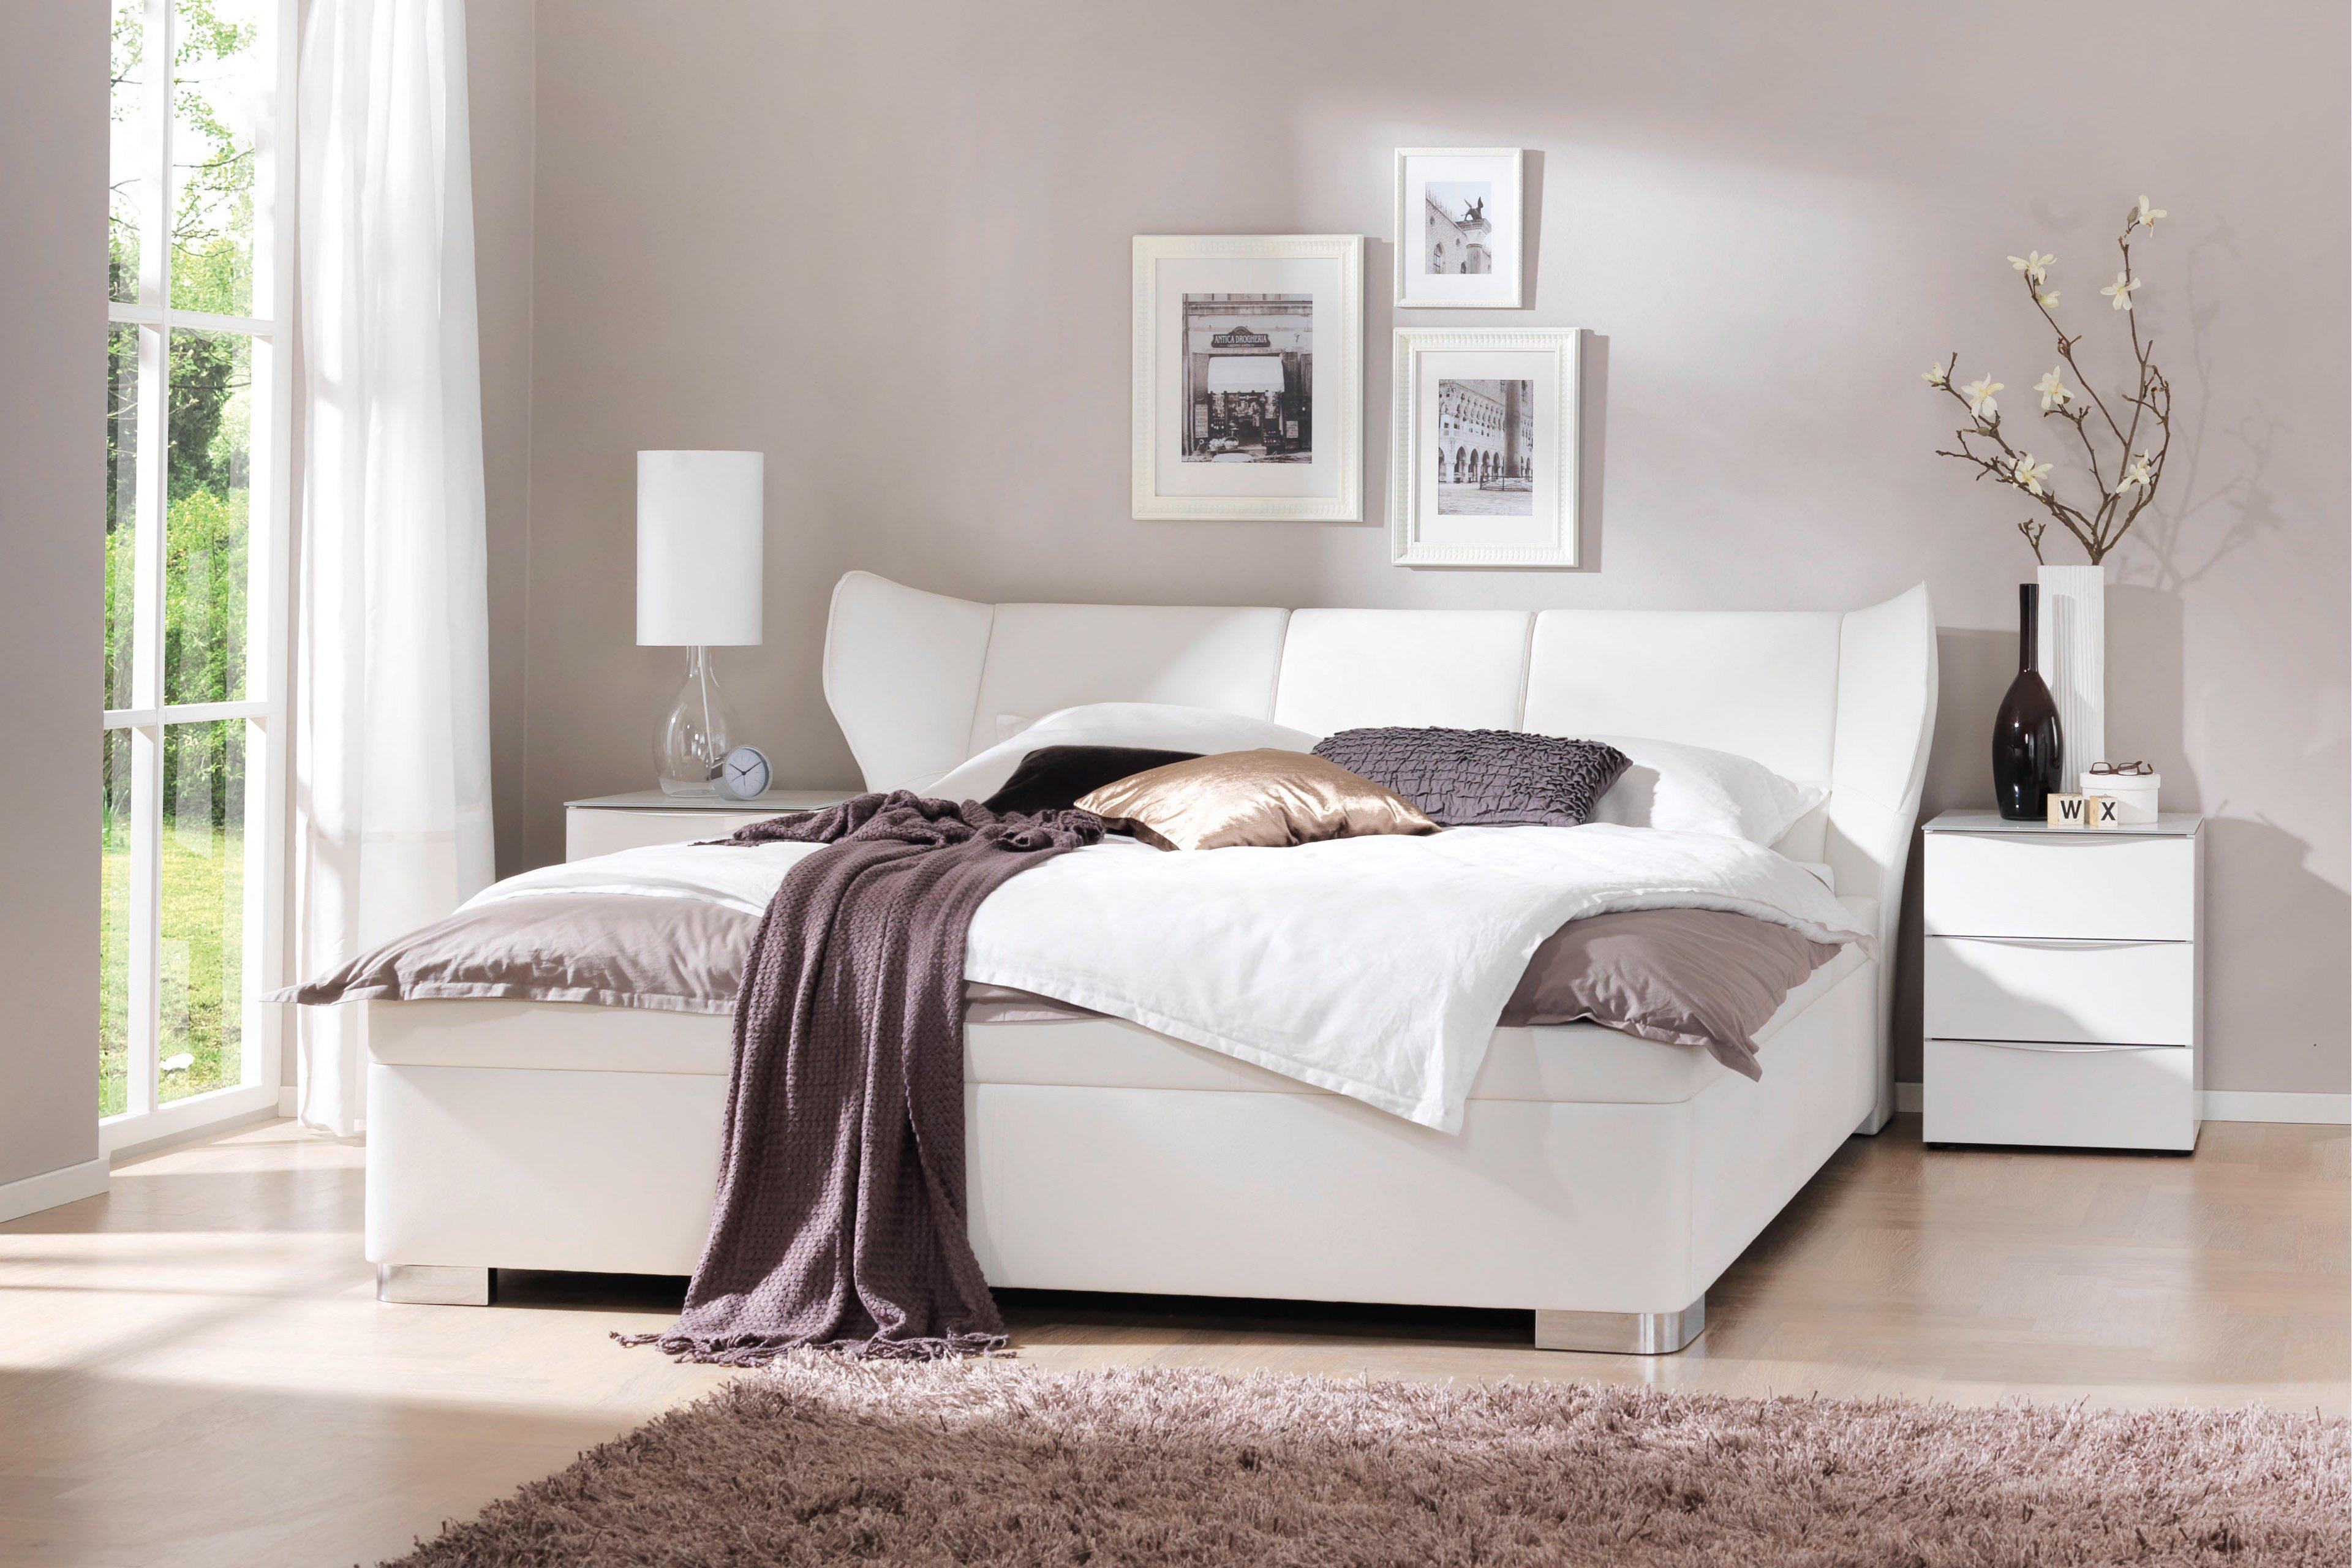 wellem bel mood polsterbett wei klapptisch m bel letz ihr online shop. Black Bedroom Furniture Sets. Home Design Ideas